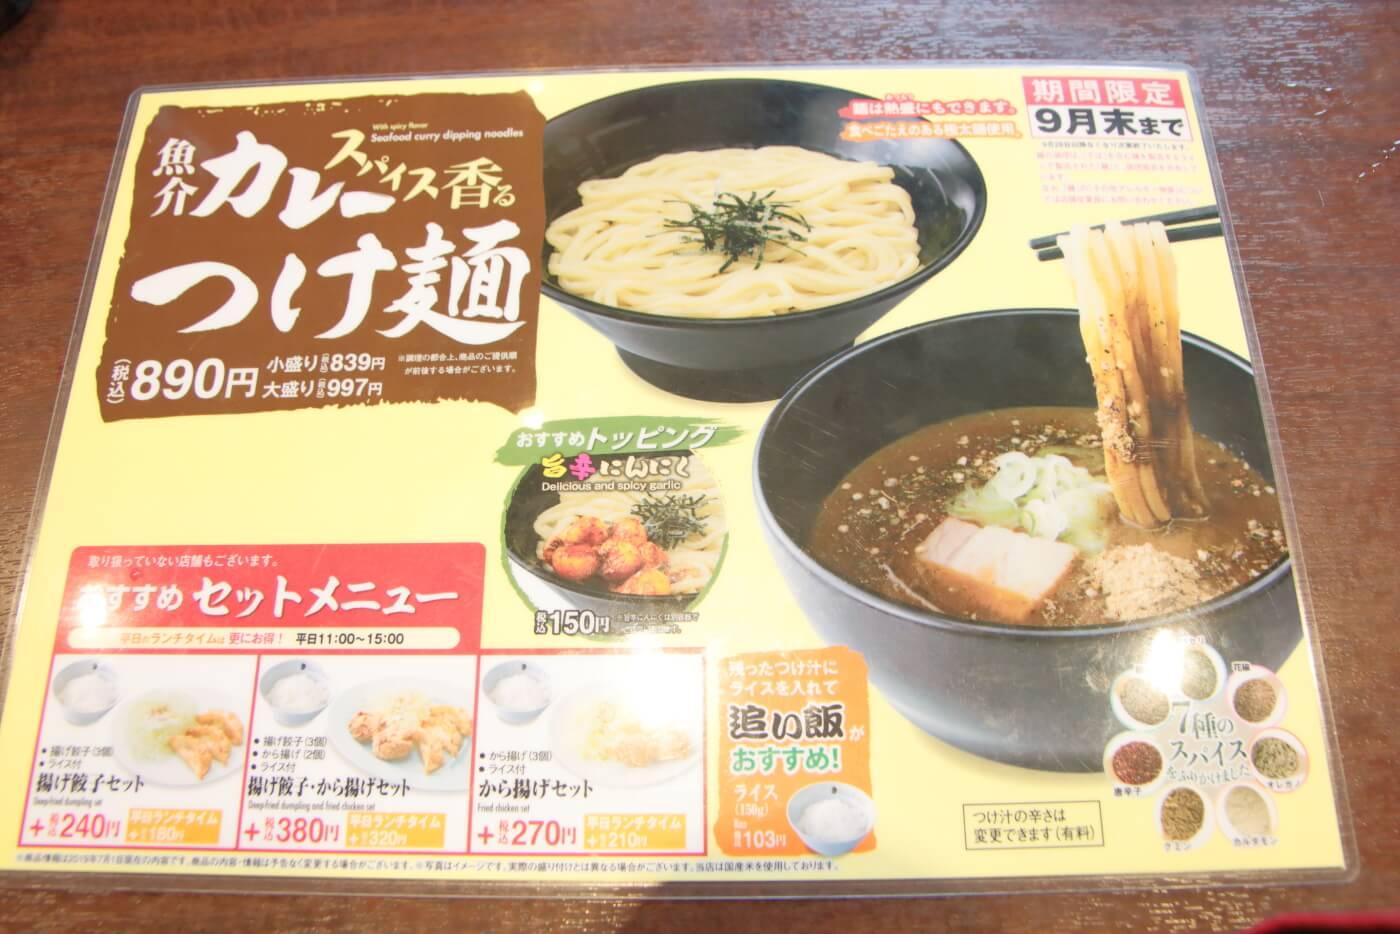 CoCo壱番屋・魚介カレーつけ麺のメニュー